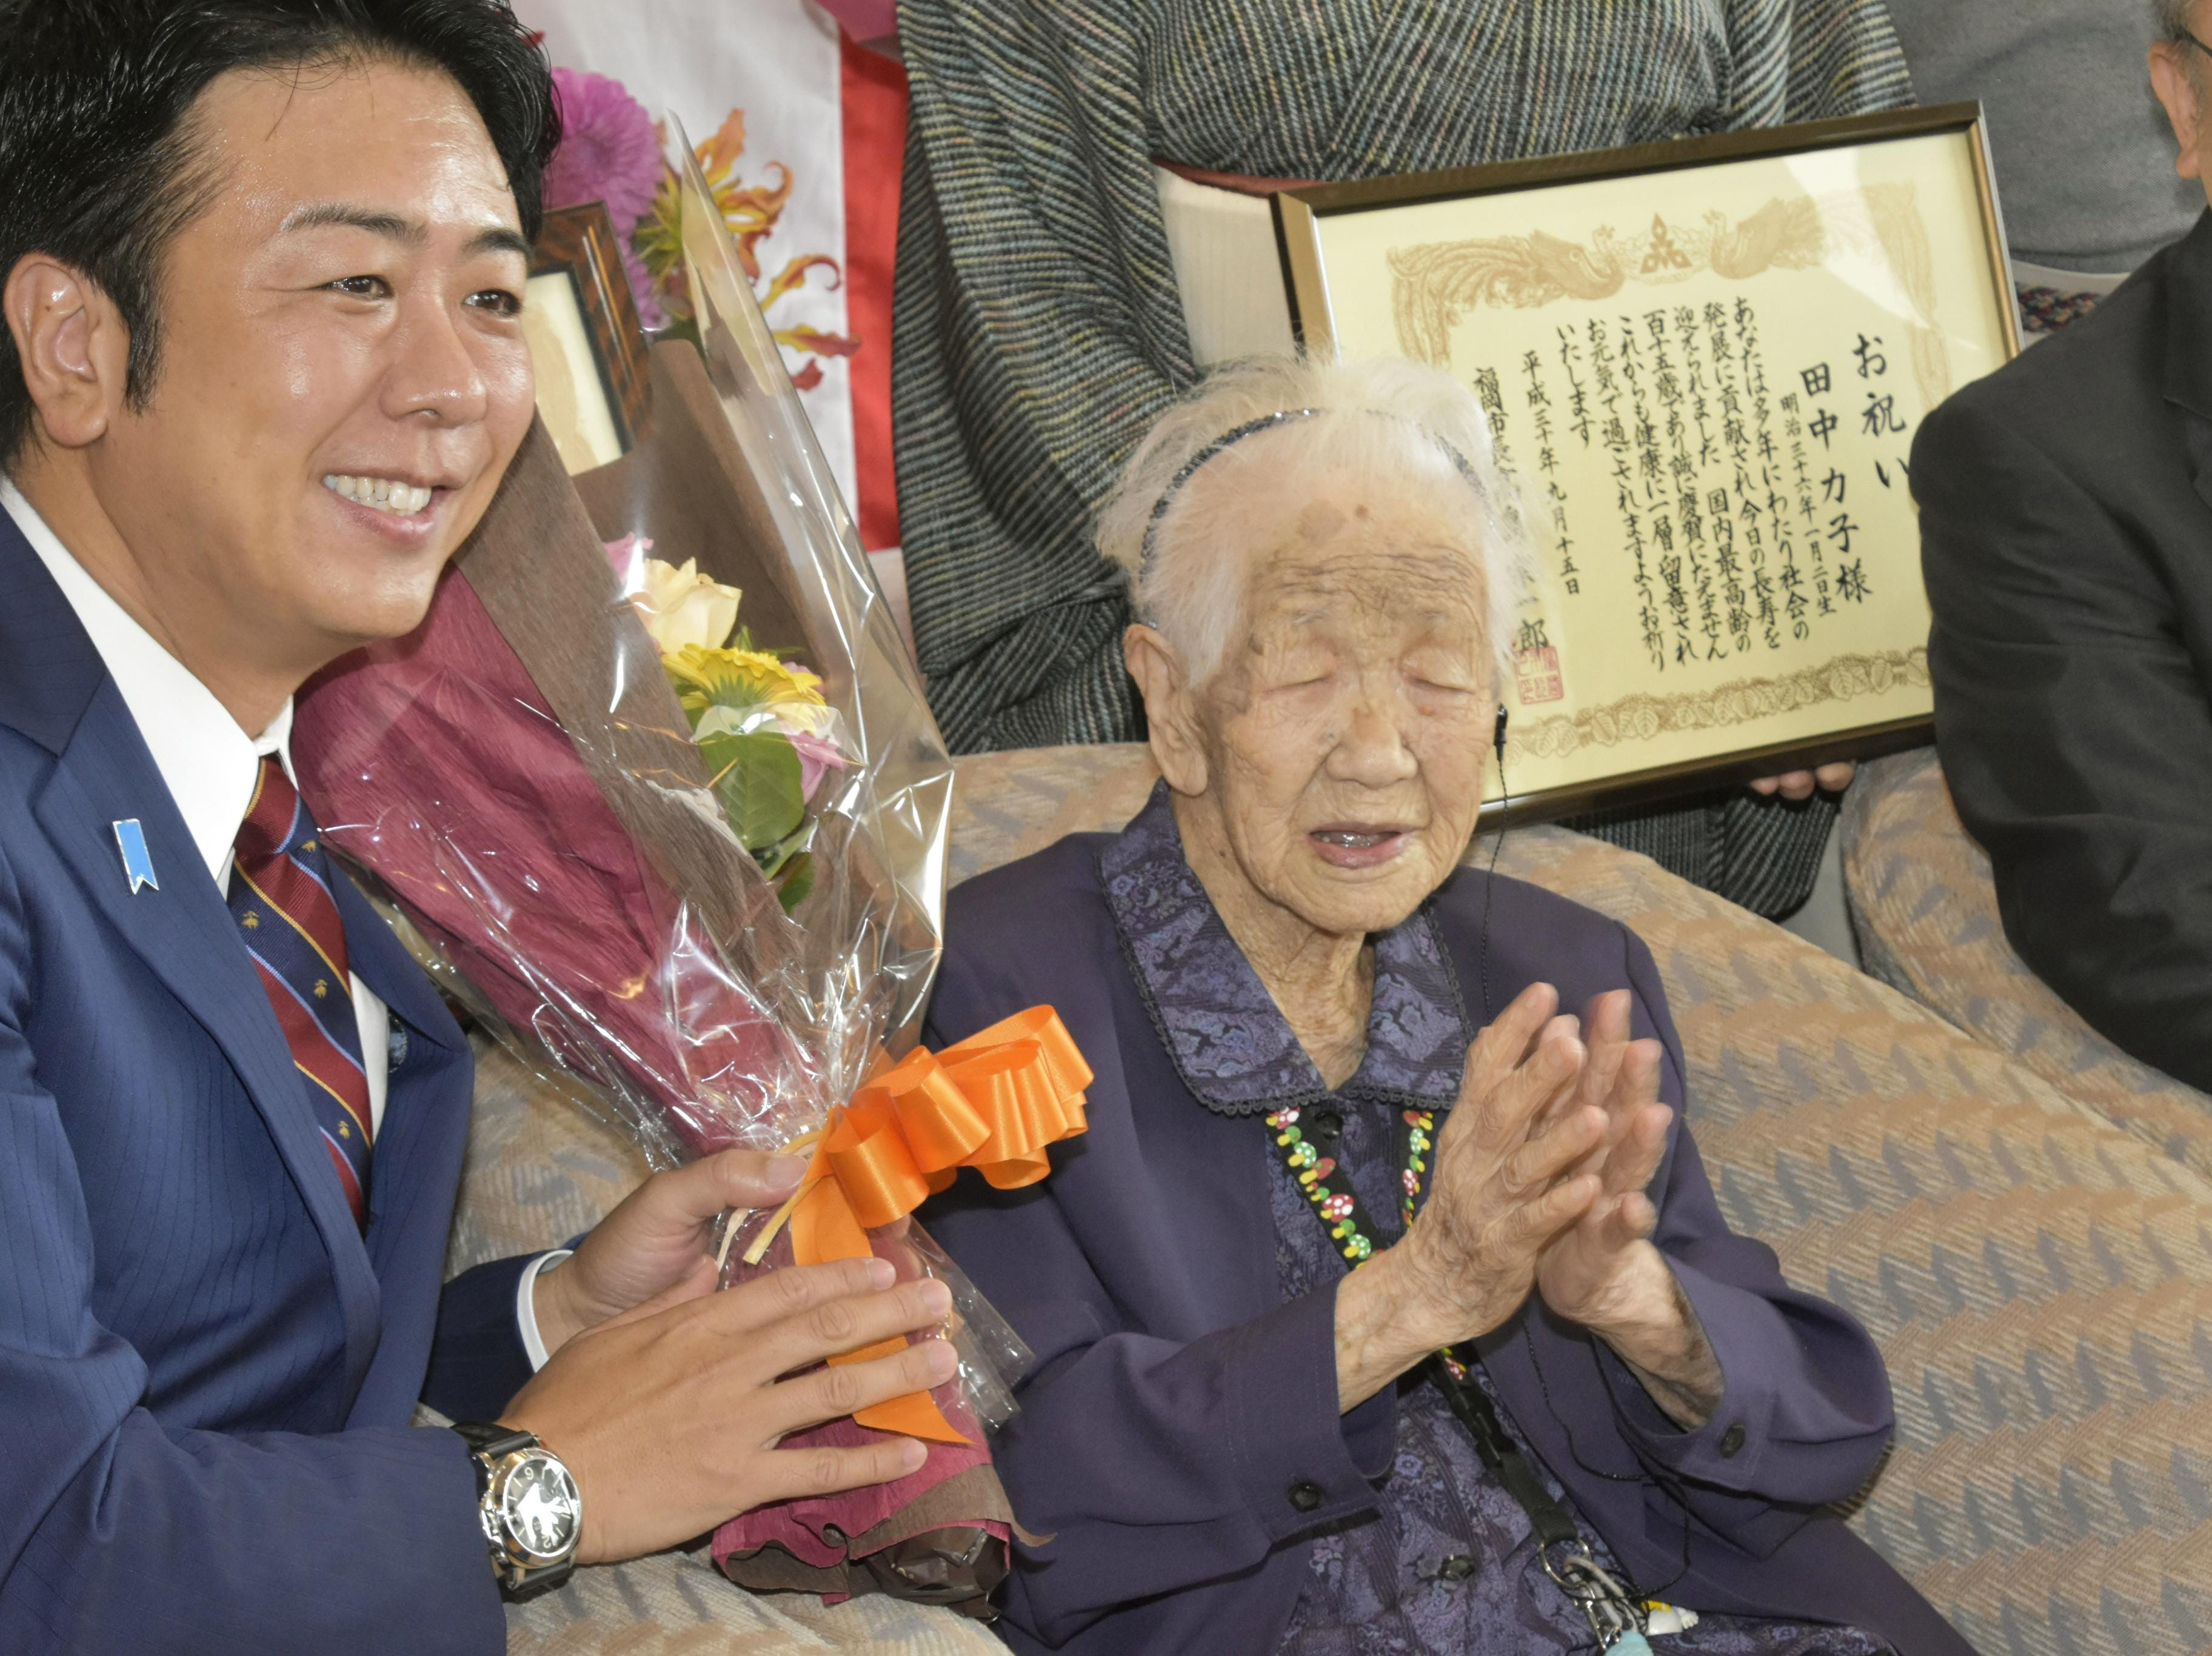 Japan's oldest living female, Kane Tanaka, 115, is honored by Fukuoka Mayor Soichiro Takashima, left, in Fukuoka on Sept. 14, 2018. Tanaka was born on Jan. 2, 1903, the year the Wright brothers flew the world's first powered airplane.